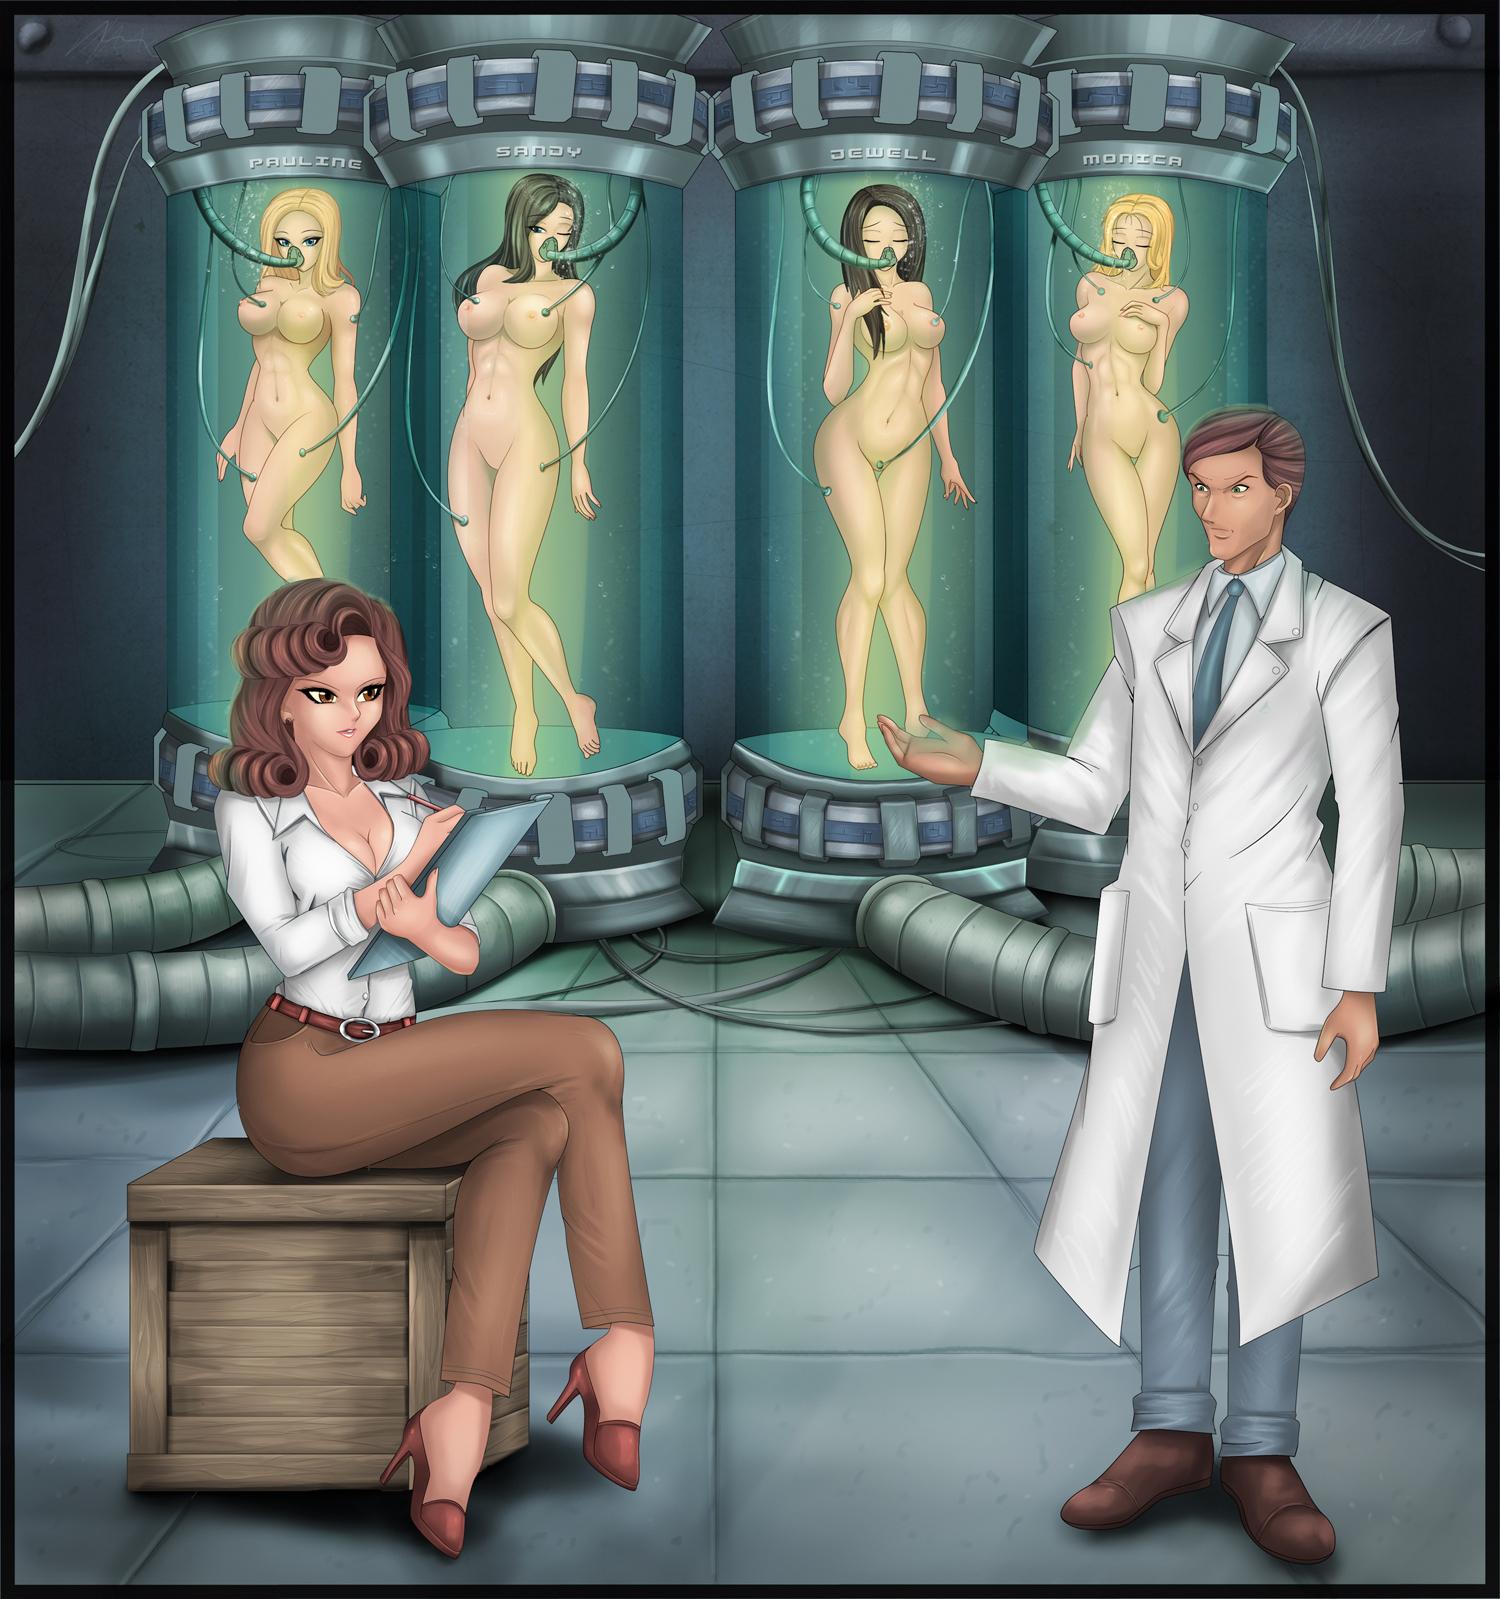 Four naked tube girls are dickered over by Kupler and Strangeways